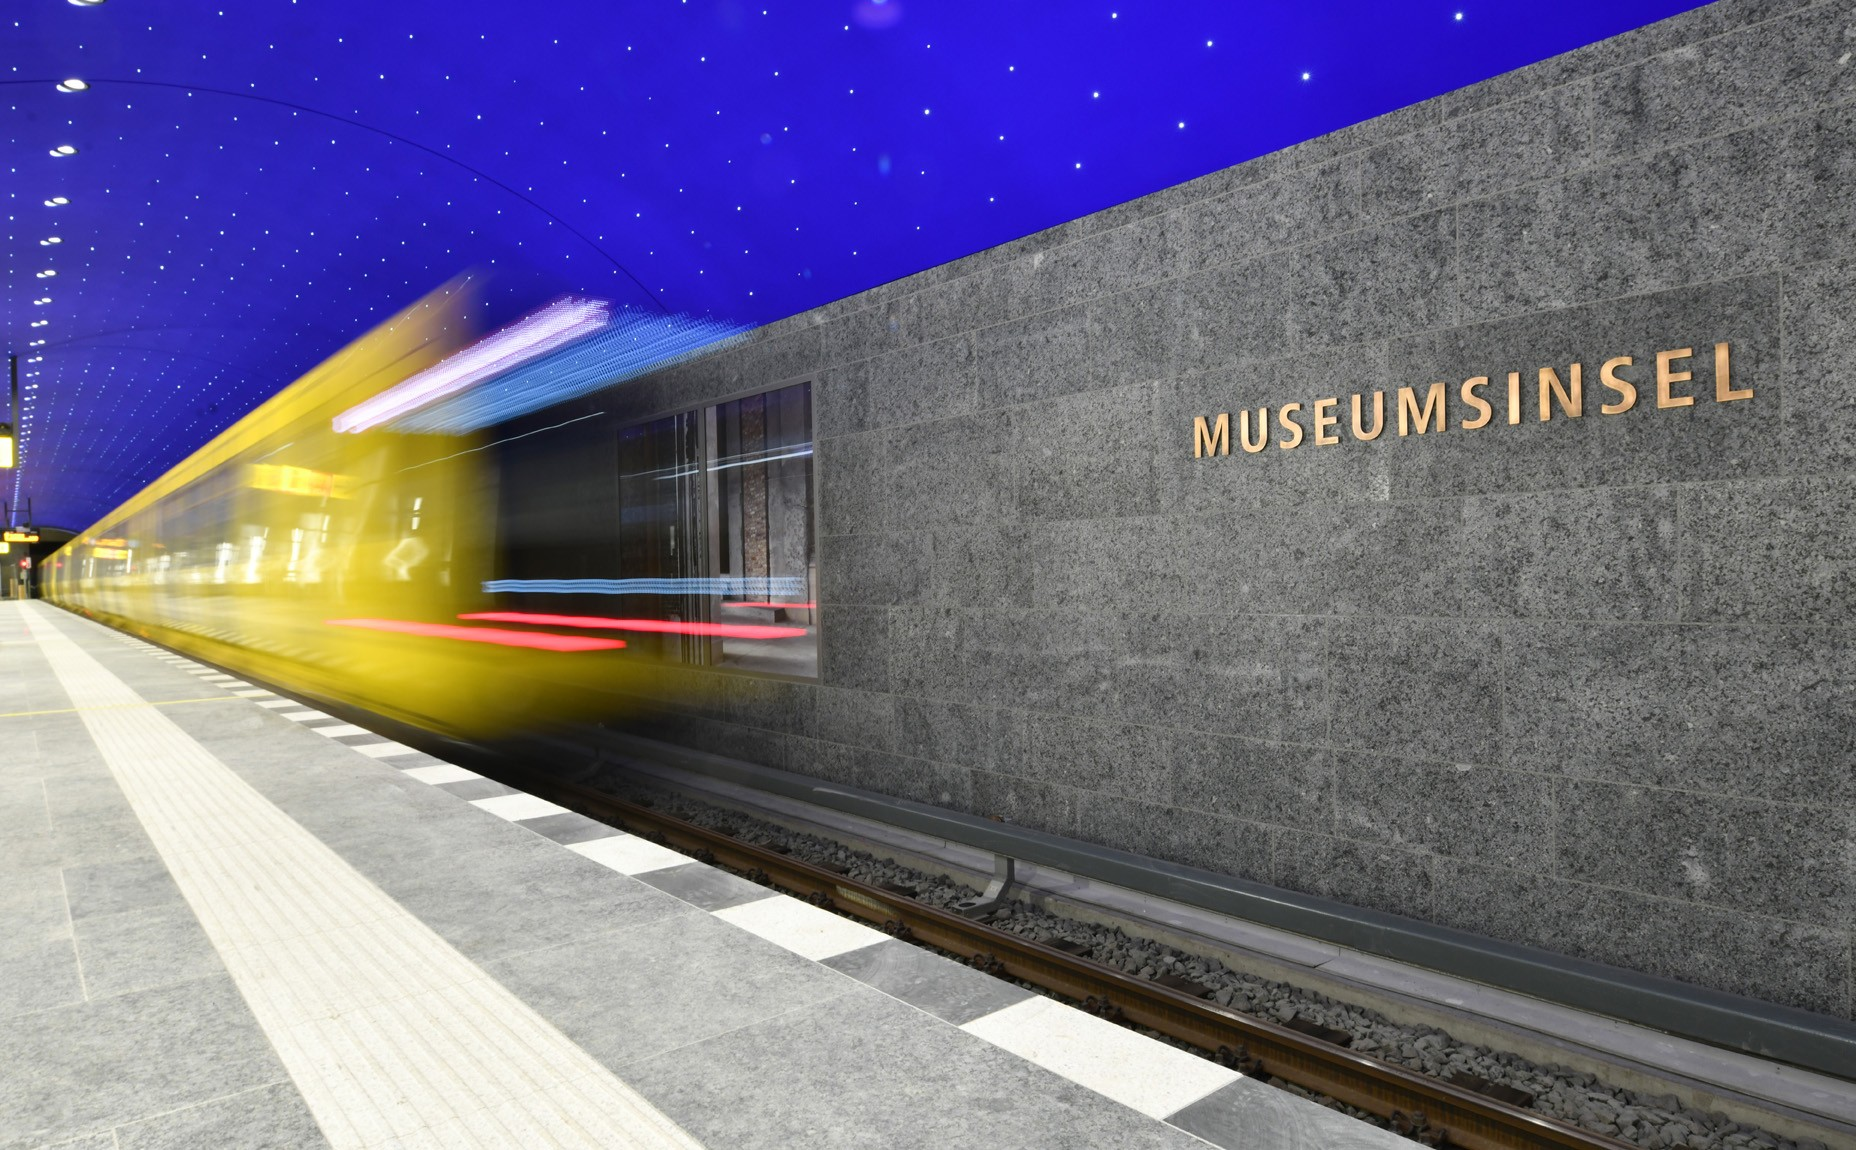 Station U_Museumsinsel_ Berlin